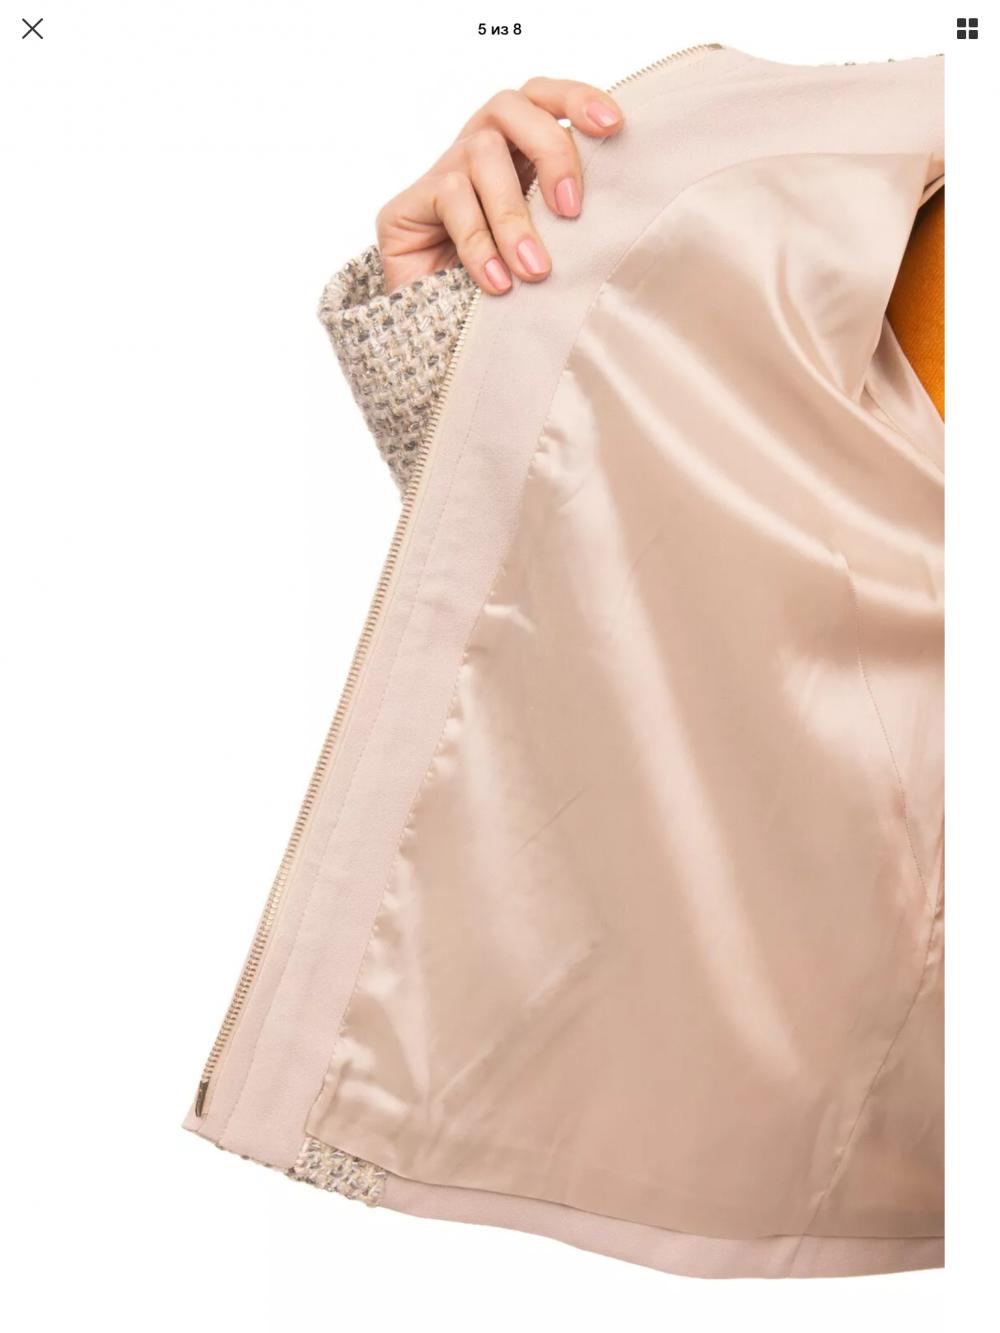 Жакет пиджак Patrizia Pepe размер 48